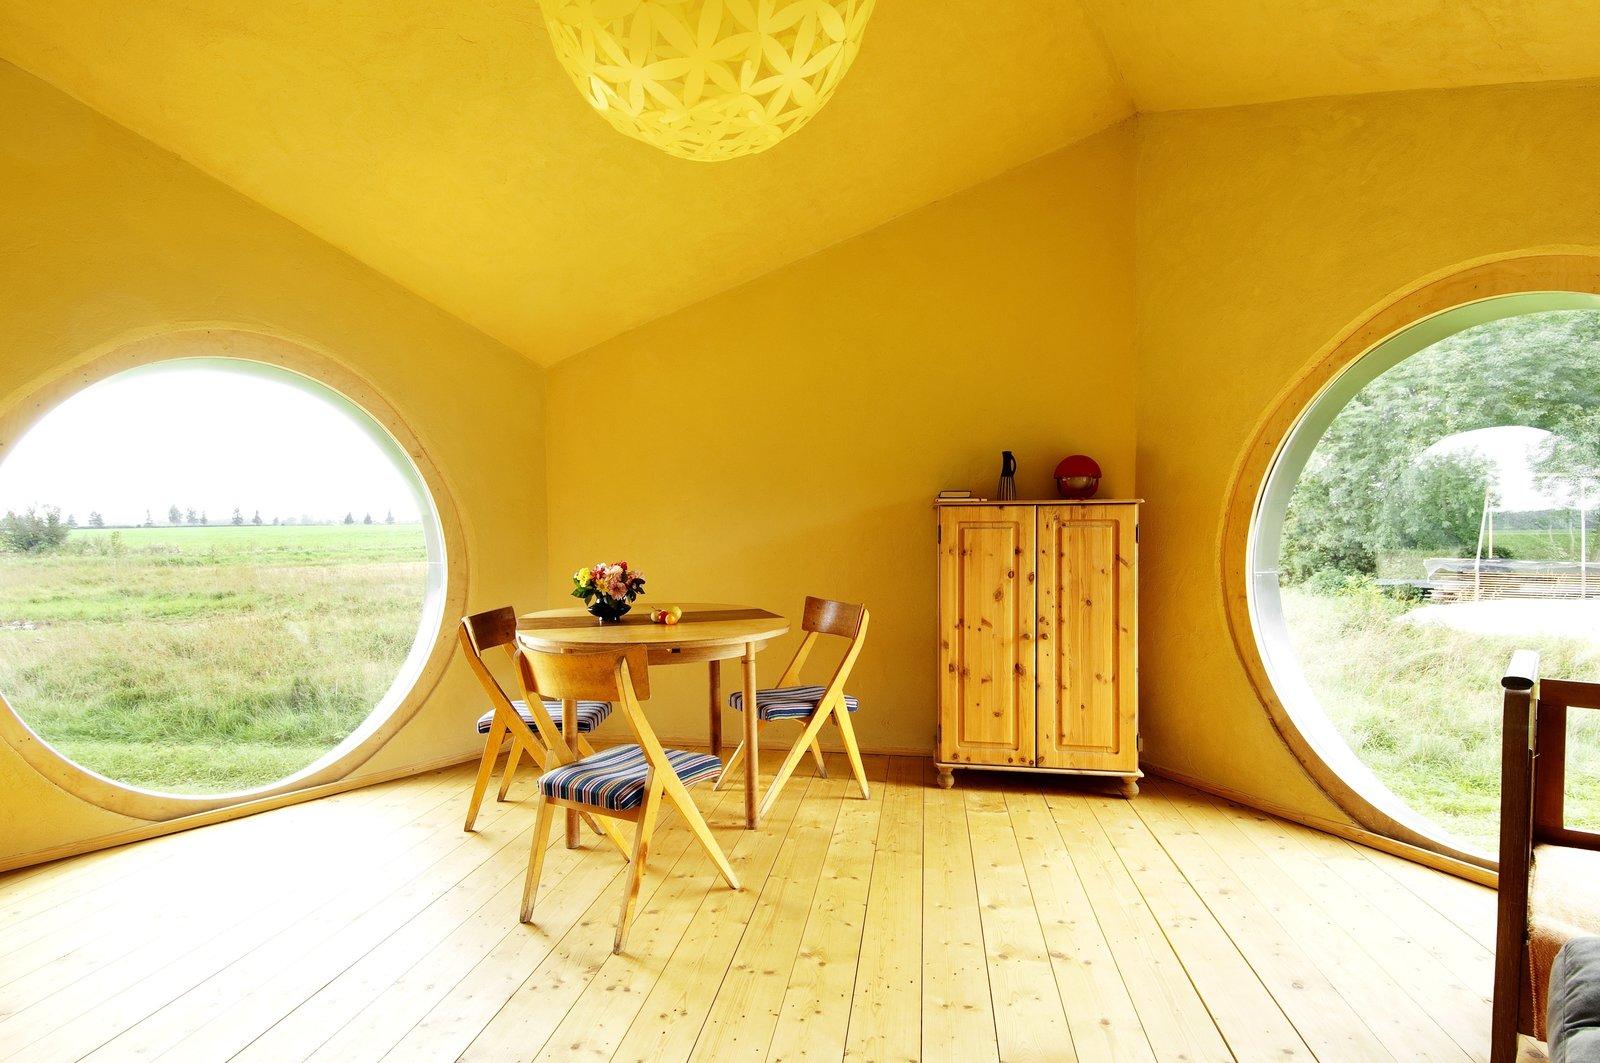 The interior of Jaanus Orgusaar's NOA cabin in the Virumaa region of Estonia. The wide windows provide a great view of the surroundings.  Photo 6 of 10 in Estonian Designer's Tiny Geometric Cabin